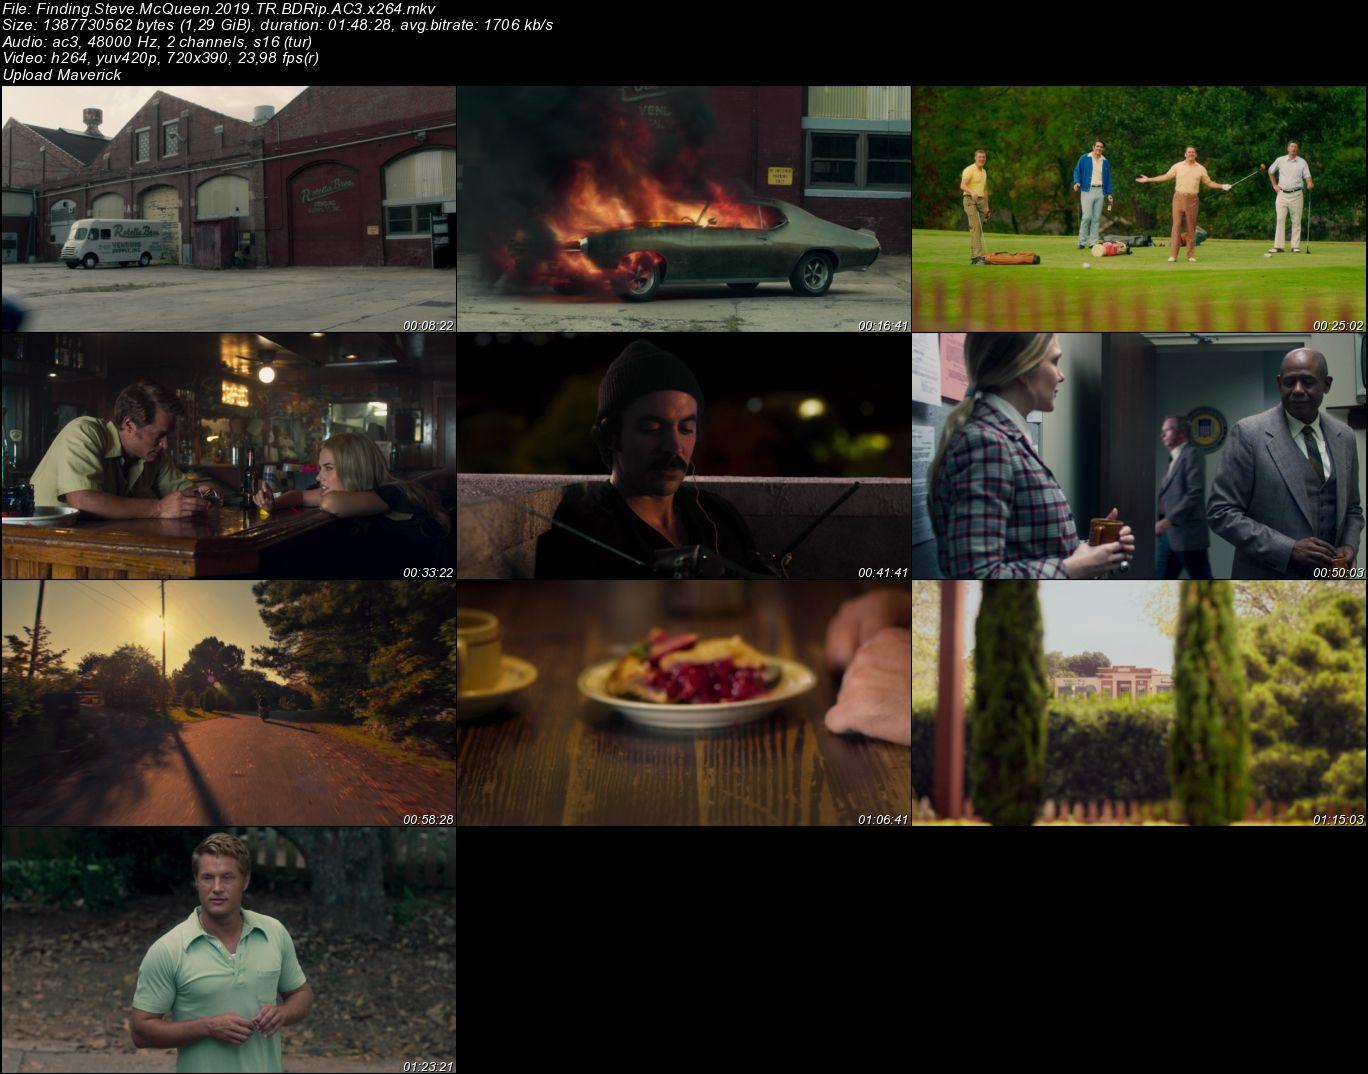 Steve McQueen'i Bulmak - 2019 Türkçe Dublaj BDRip XviD indir